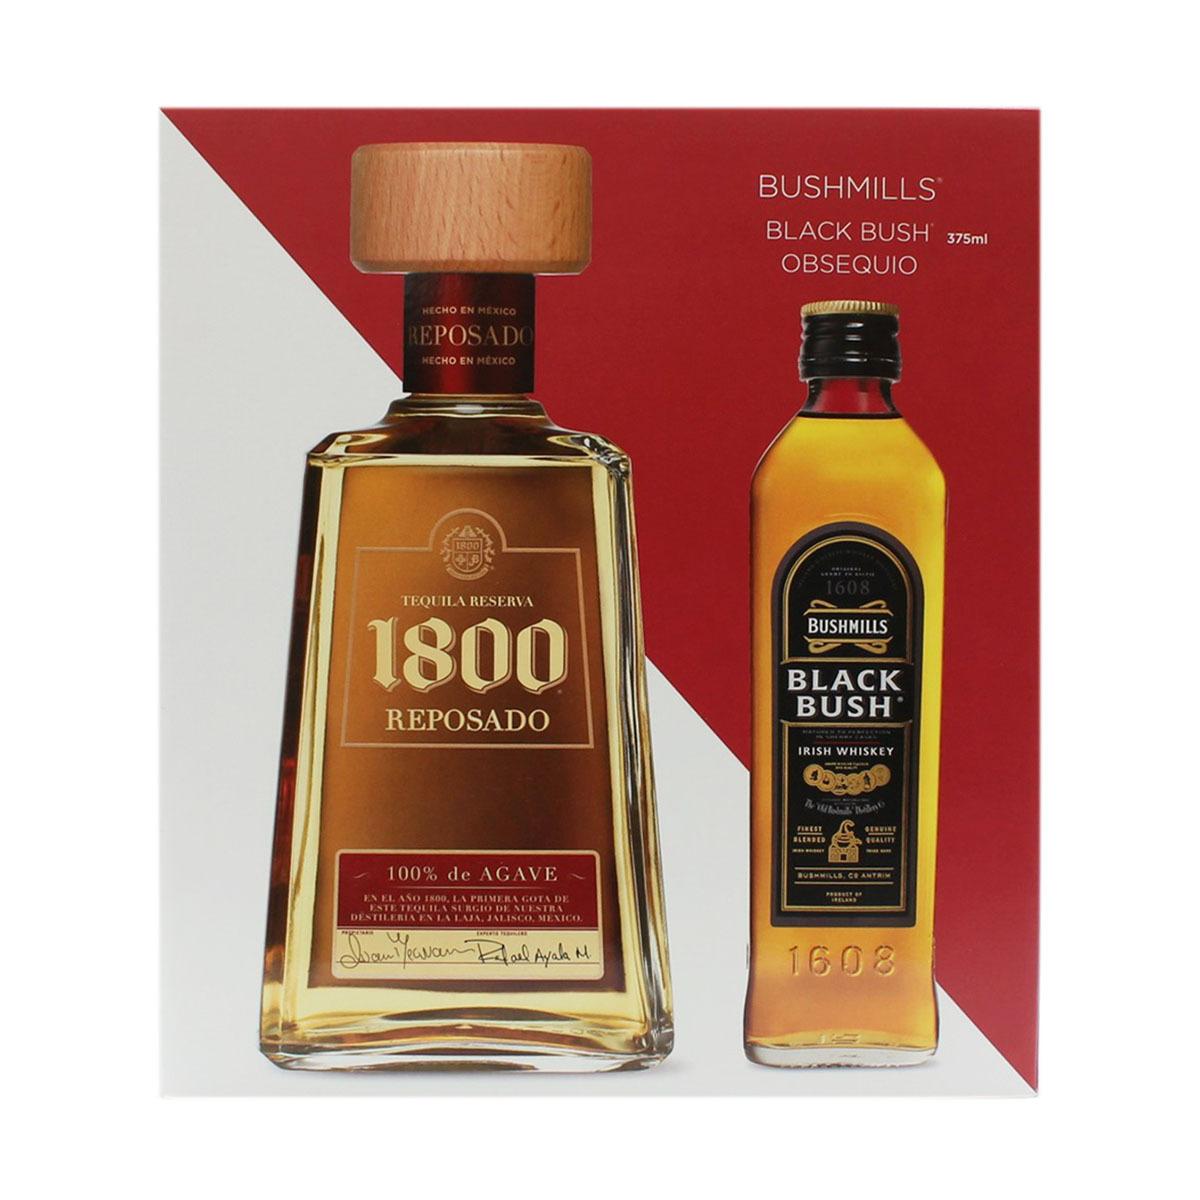 Chedraui en línea: Tequila 1800 rep + Bushmills 375 ml